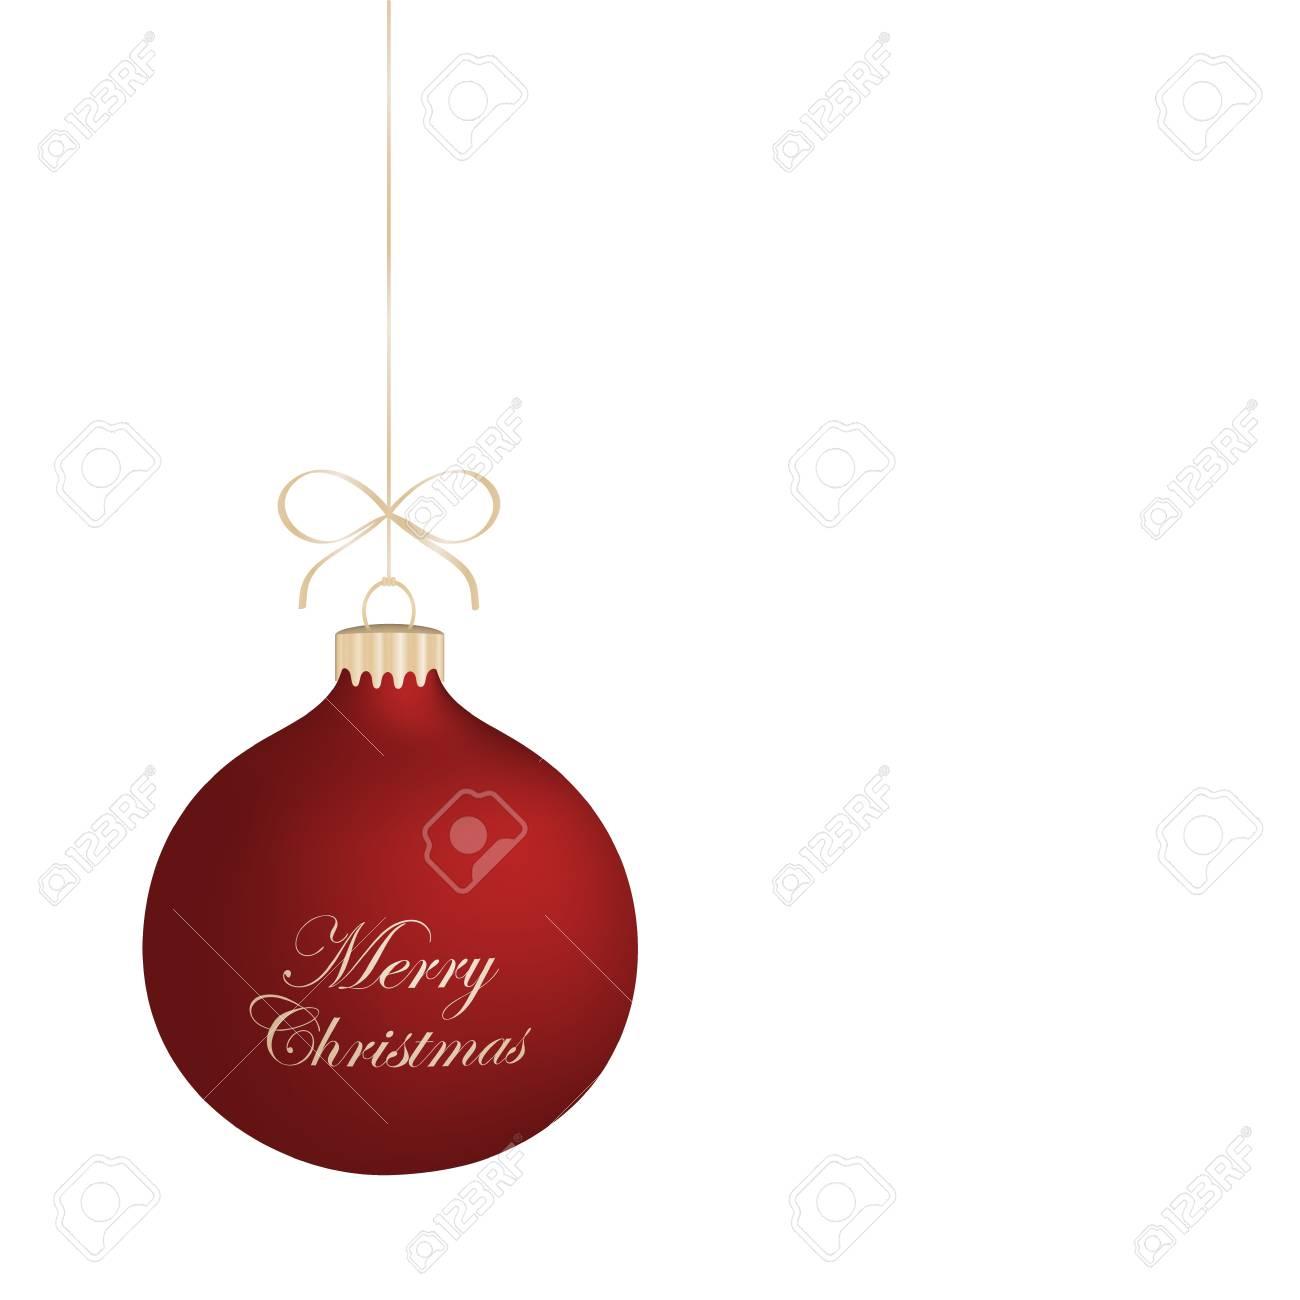 Isolated realistic vector Christmas ball Stock Vector - 16188983